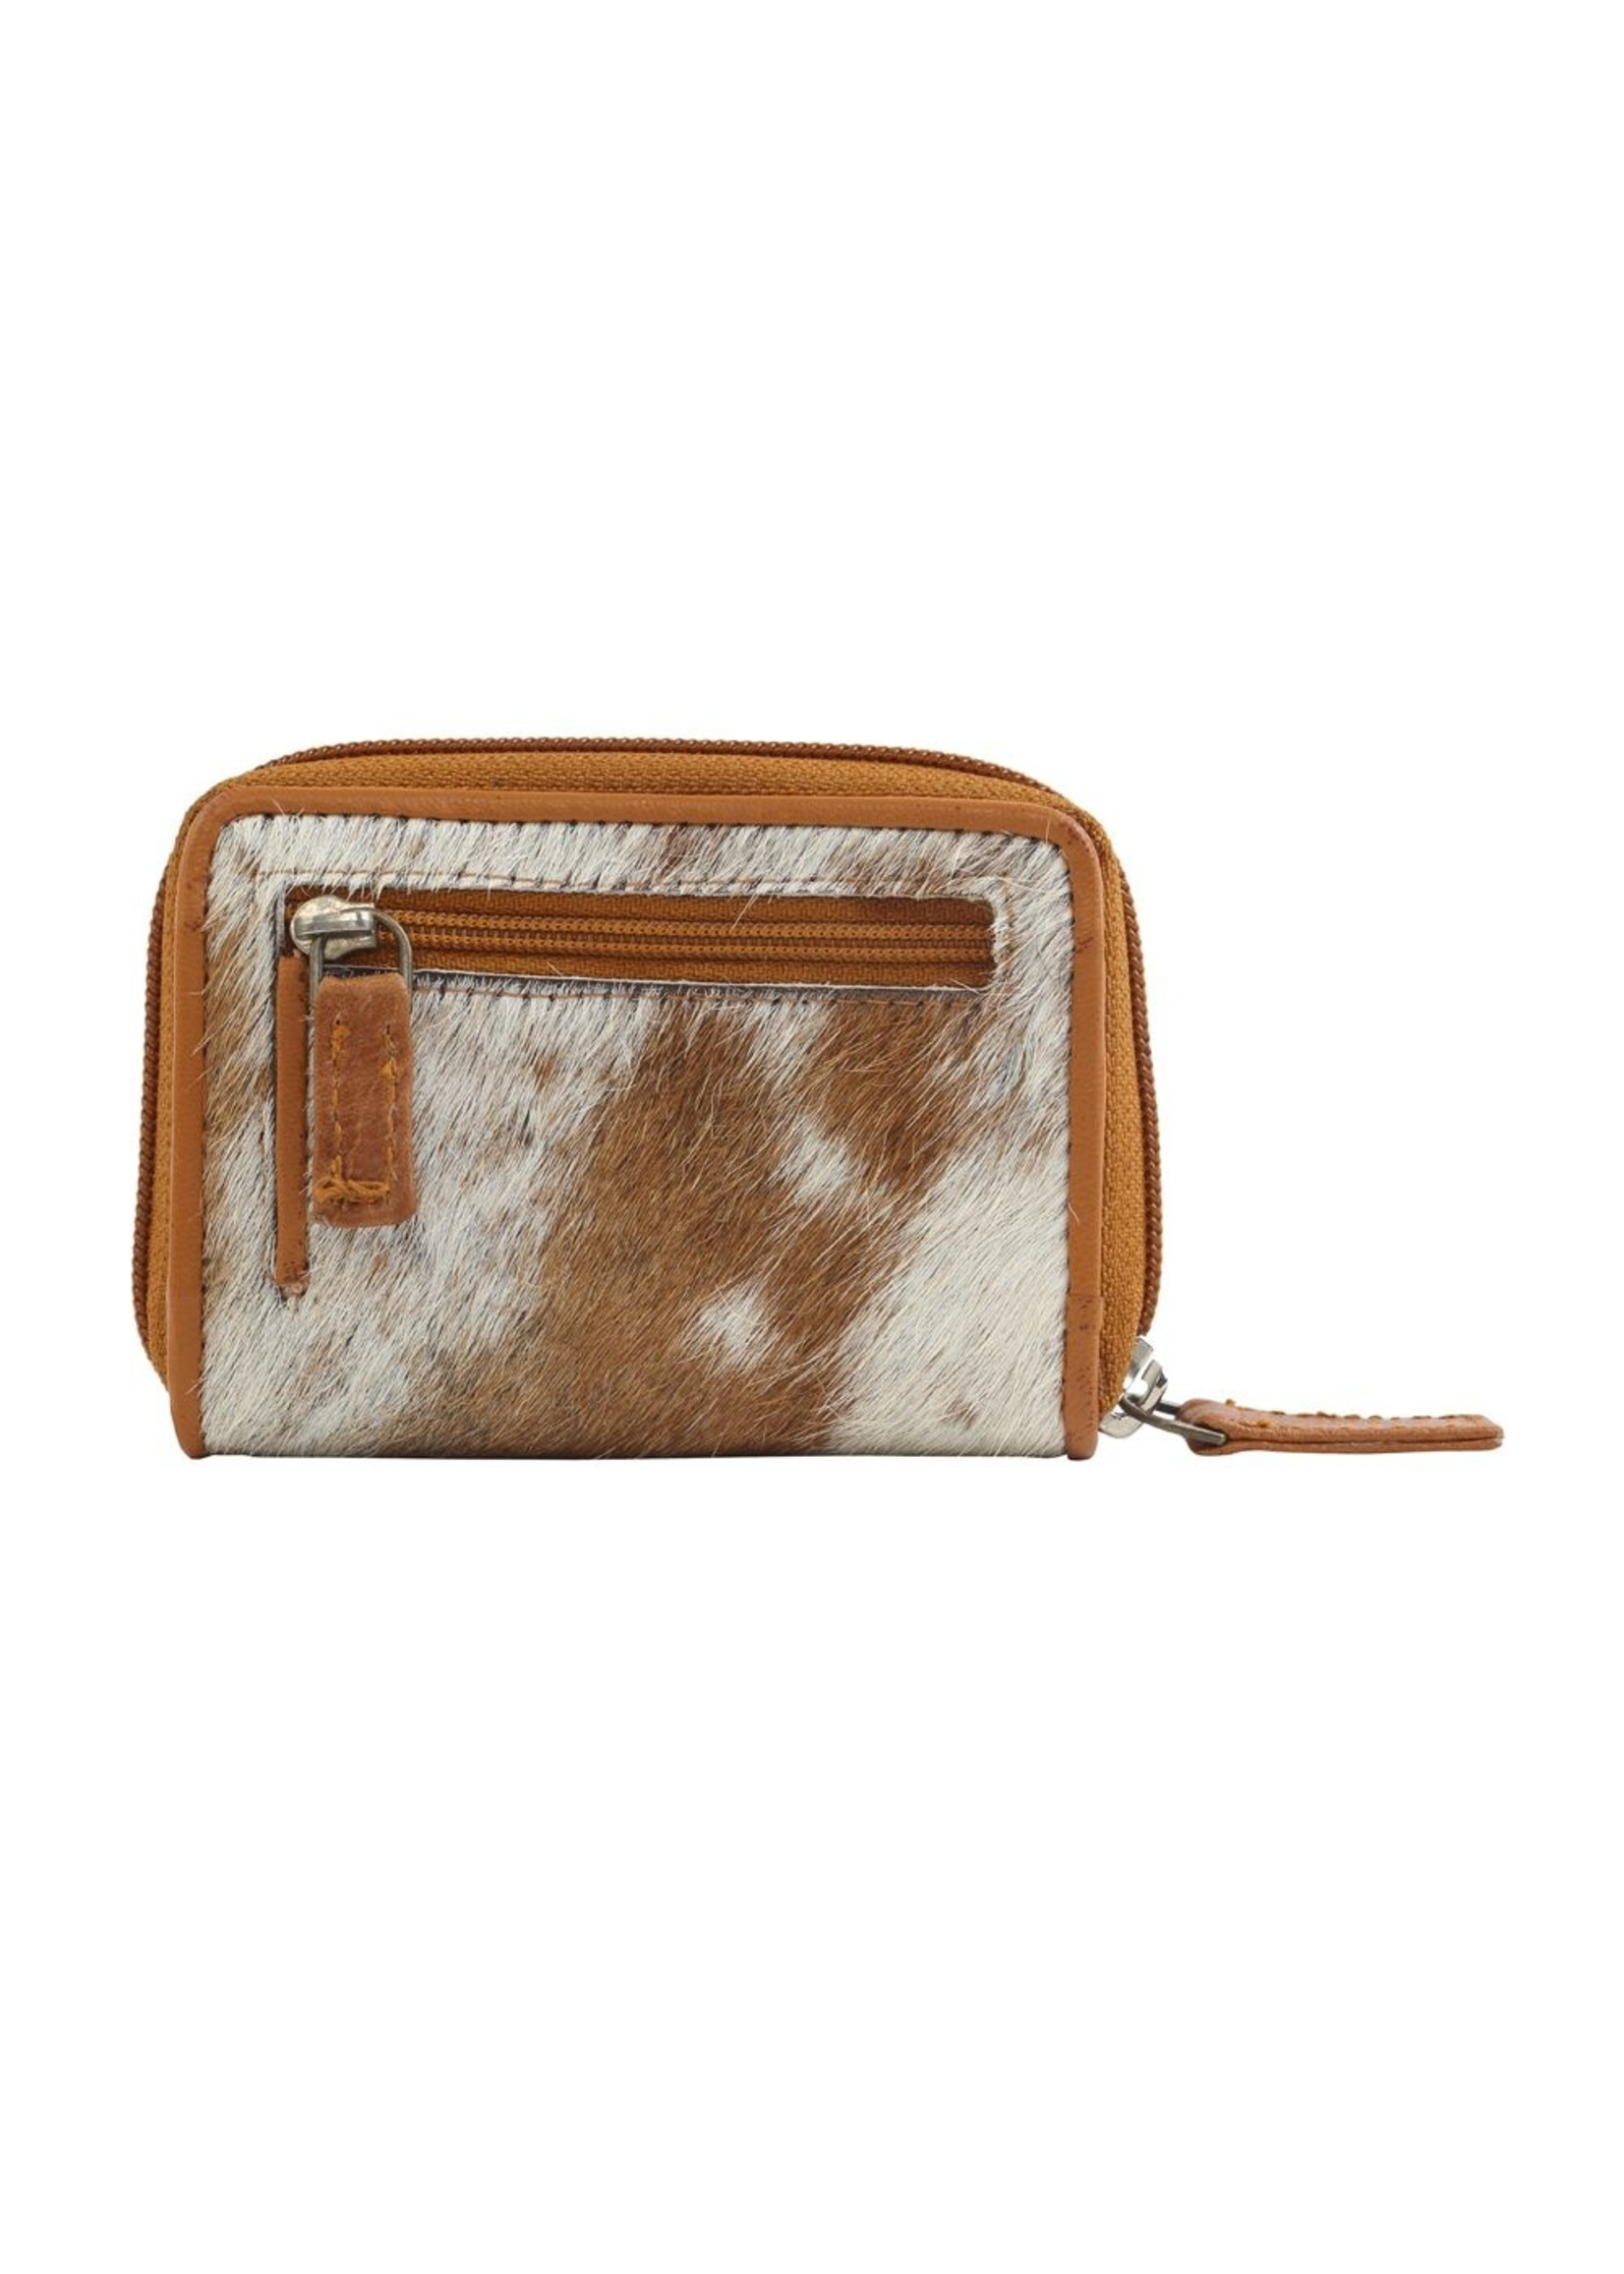 myra bags Declared Winner Leather & Hairon Wallet